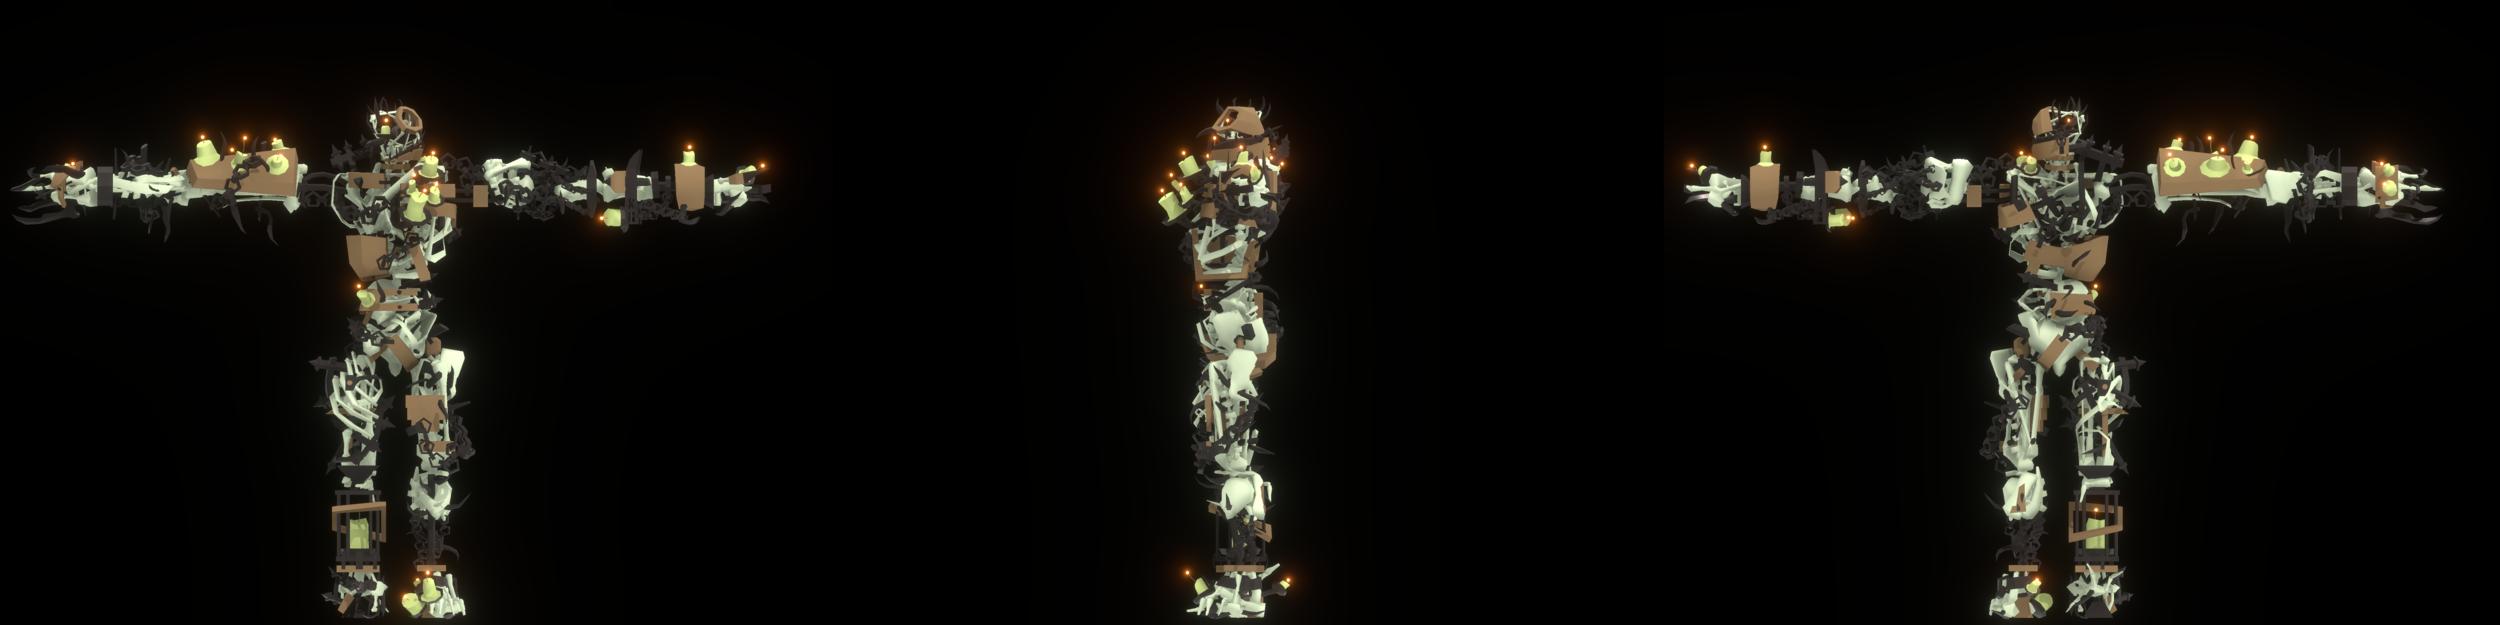 Dismantle: Construct Carnage, Character Design Retrospective, Great Helm - 17